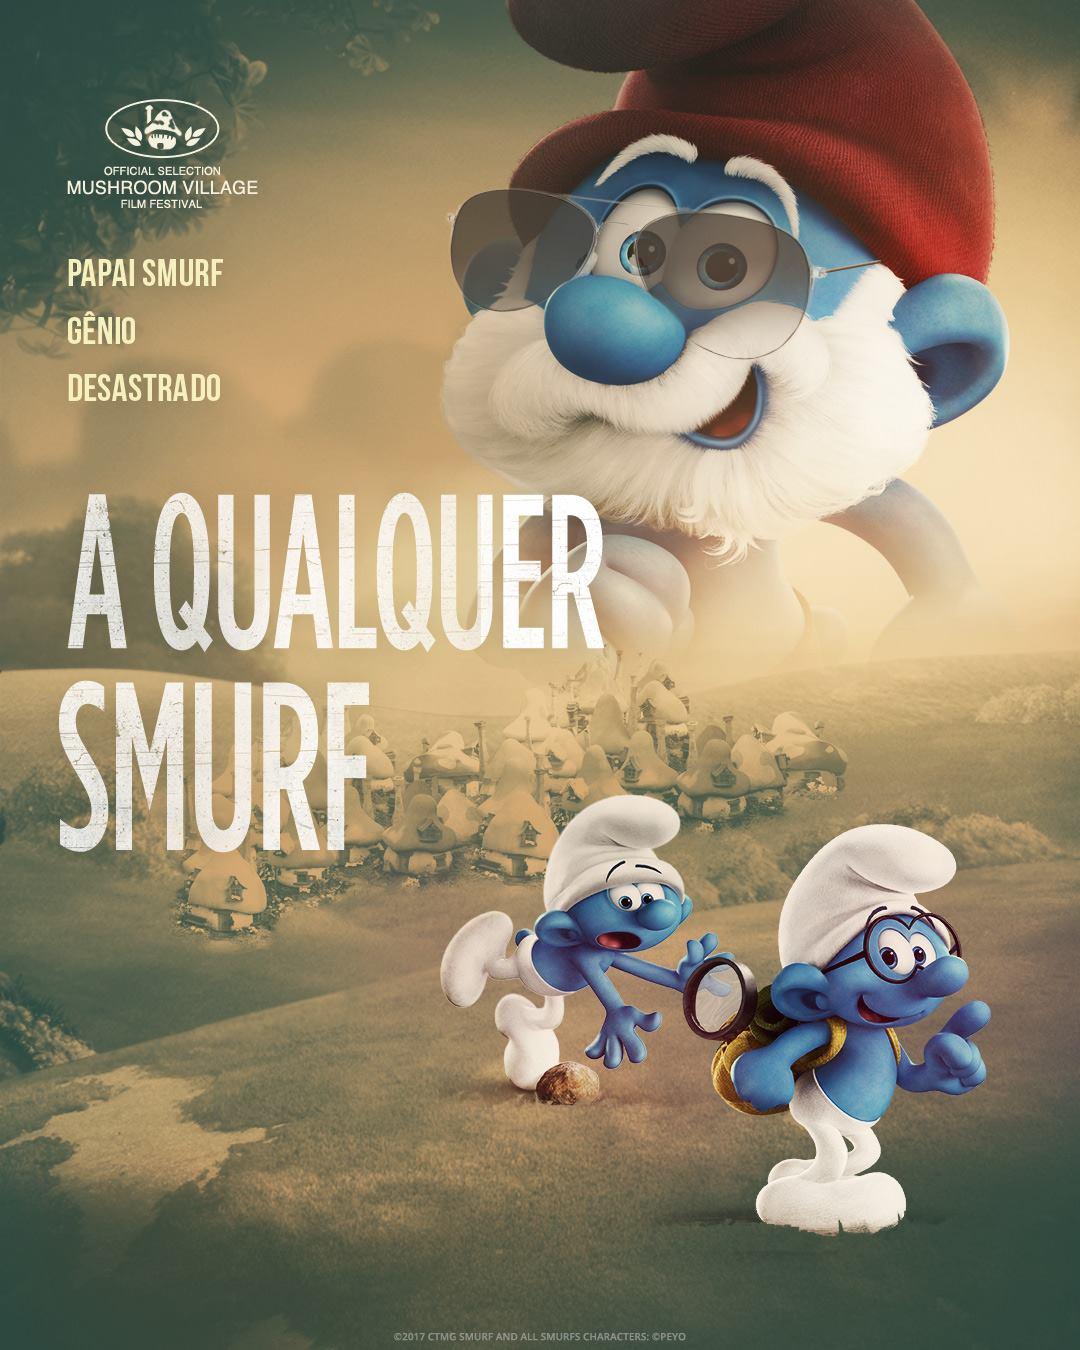 Smurfs_Oscar_03